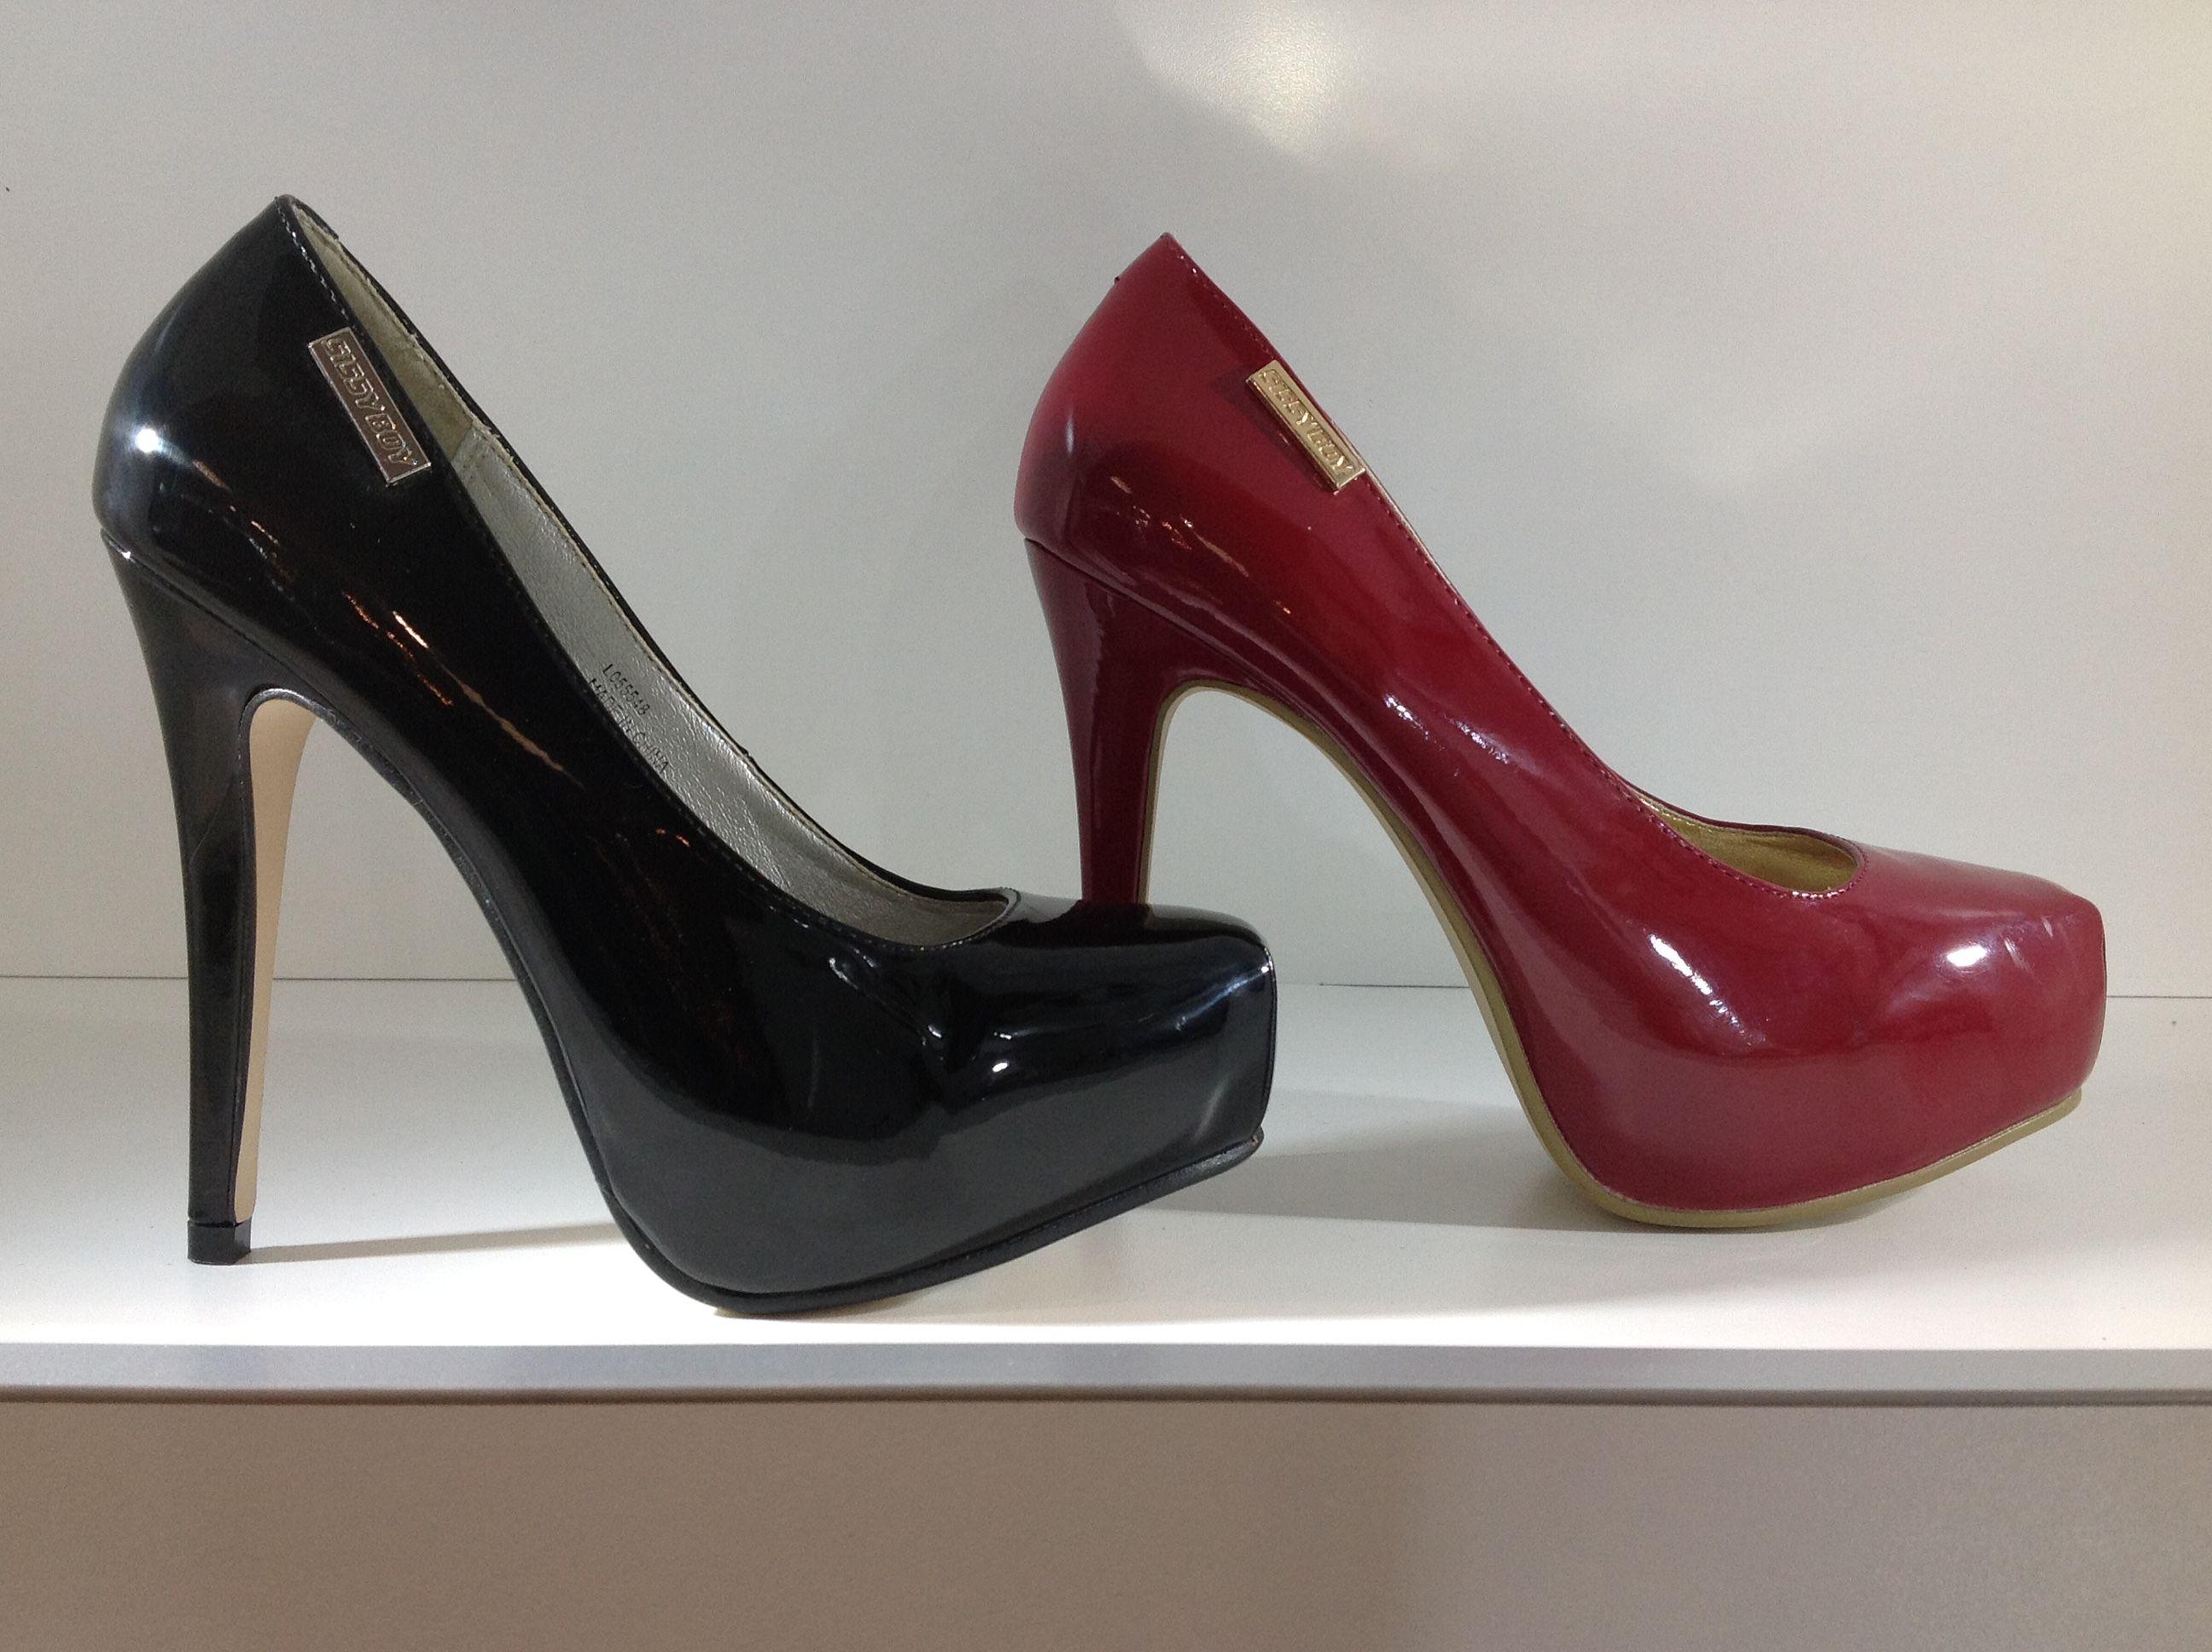 bd8e04fbf7e4 Sissy Boy Black   Red Patent Leather High Heel Platform